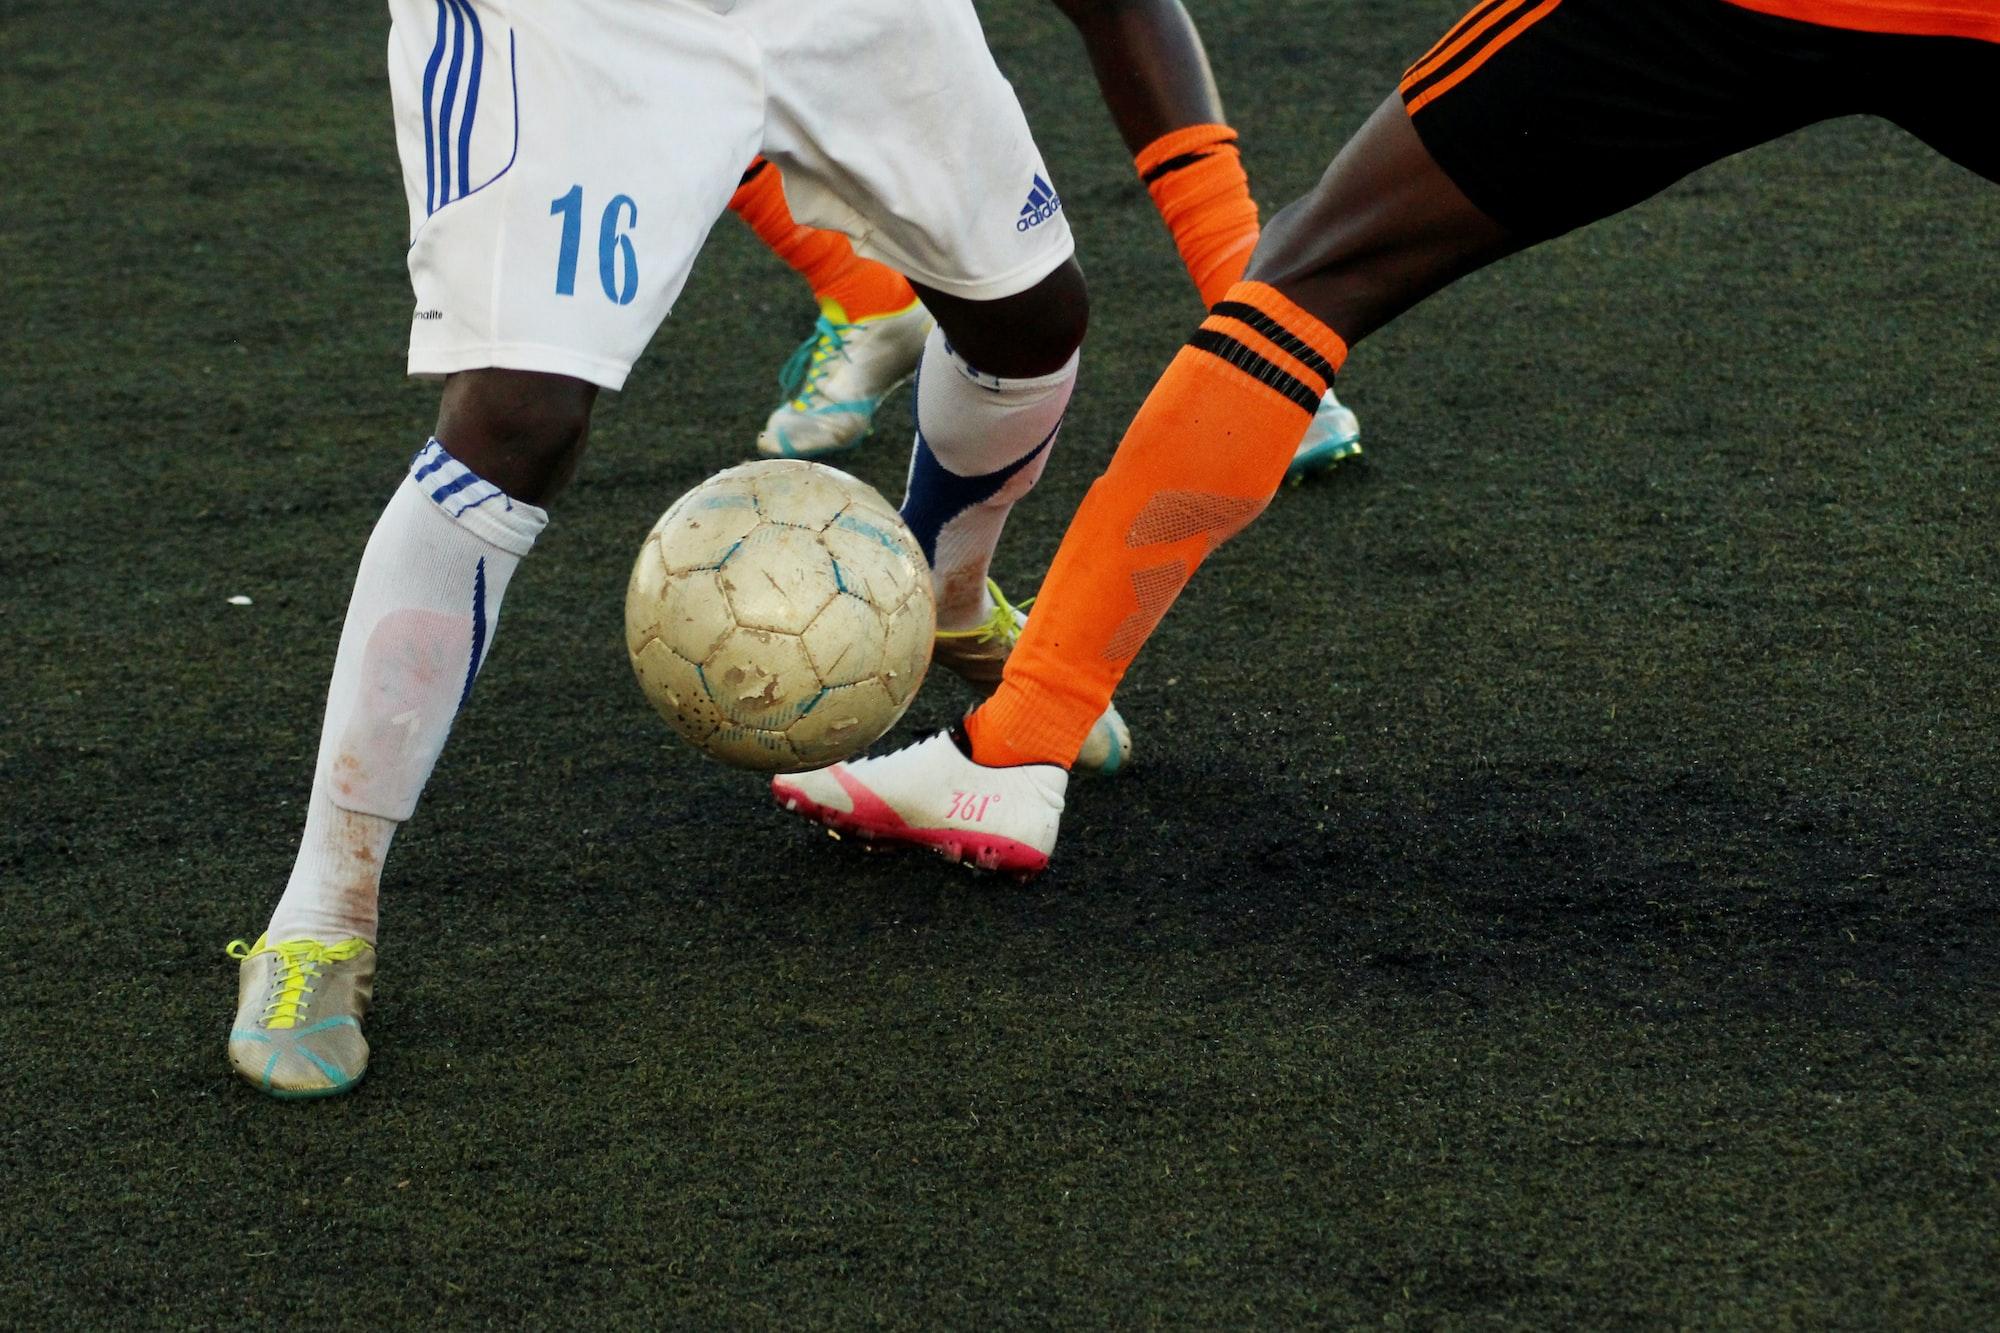 Schedina calcio: pronostici del lunedì - 23/11/2020